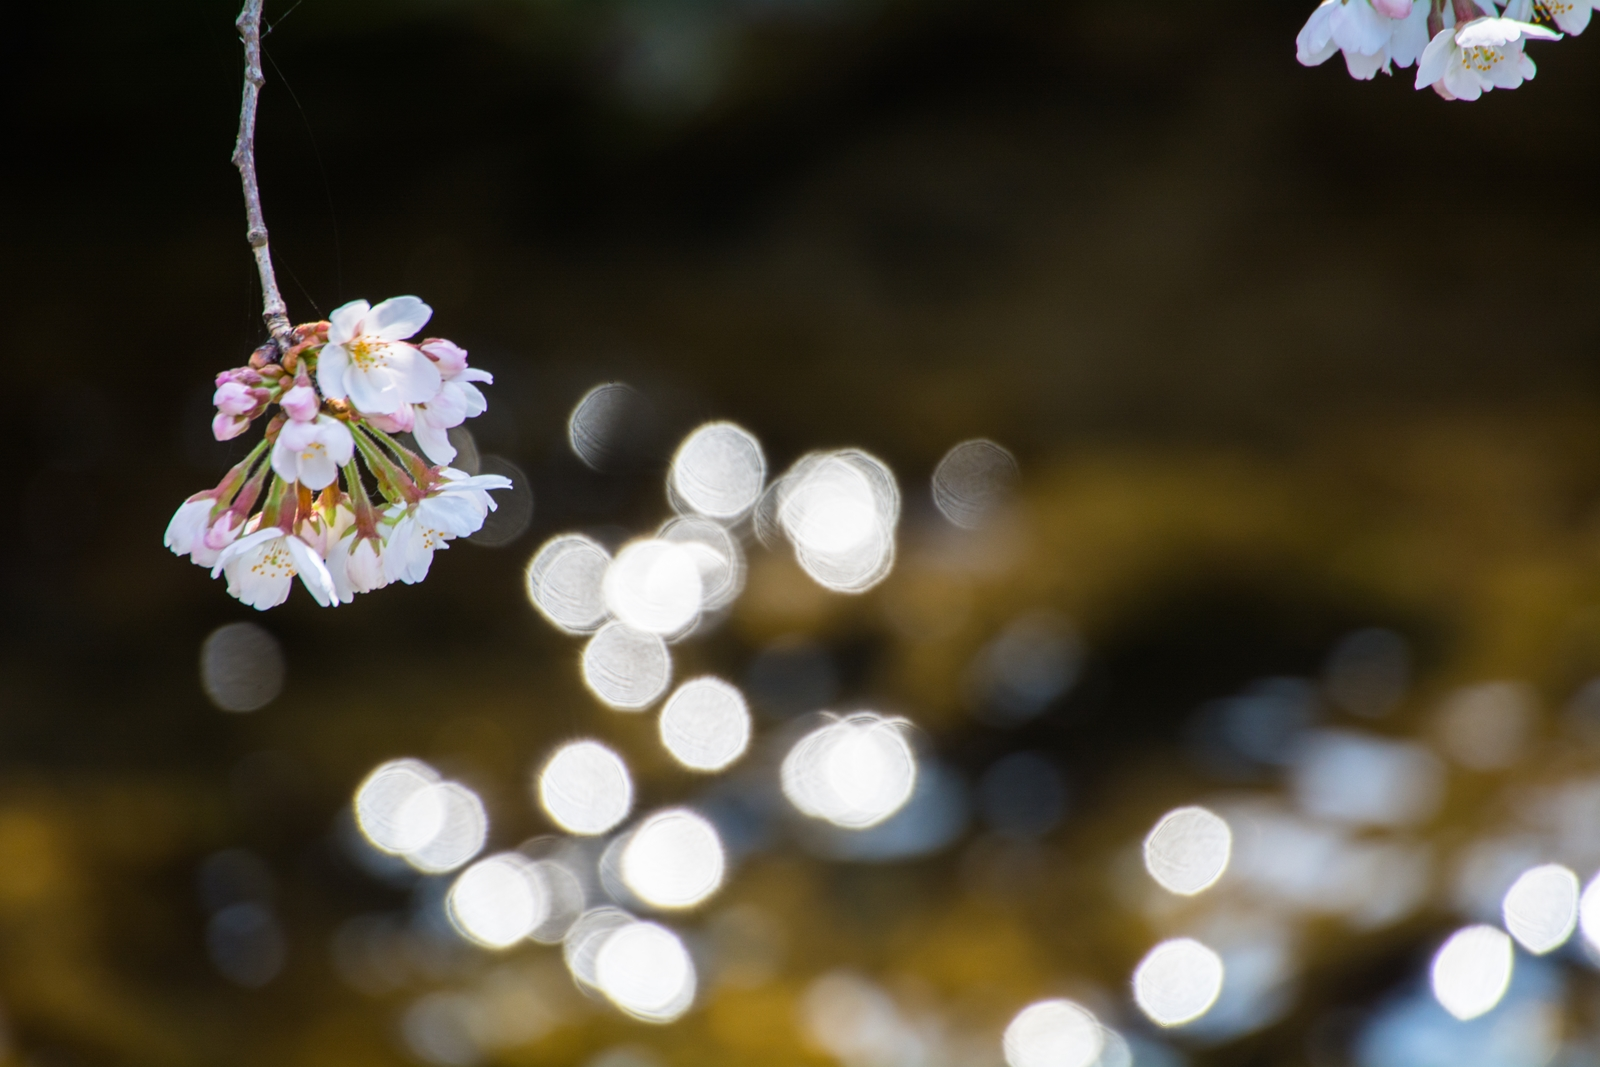 Photo: 開花の光を散らす Falling the shine of blooming.  花開く 待ちわびたその時 短くも精いっぱいに 存在を残すため その輝きを放つ  (川崎市二ヶ領用水の桜) #fujisakura #cooljapan #365cooljapanmay  #flower  Nikon D7100 SIGMA APO 50-500mm F5-6.3 DG OS HSM [ Day321, March 29th ] (7枚追加:Added 7 photo)